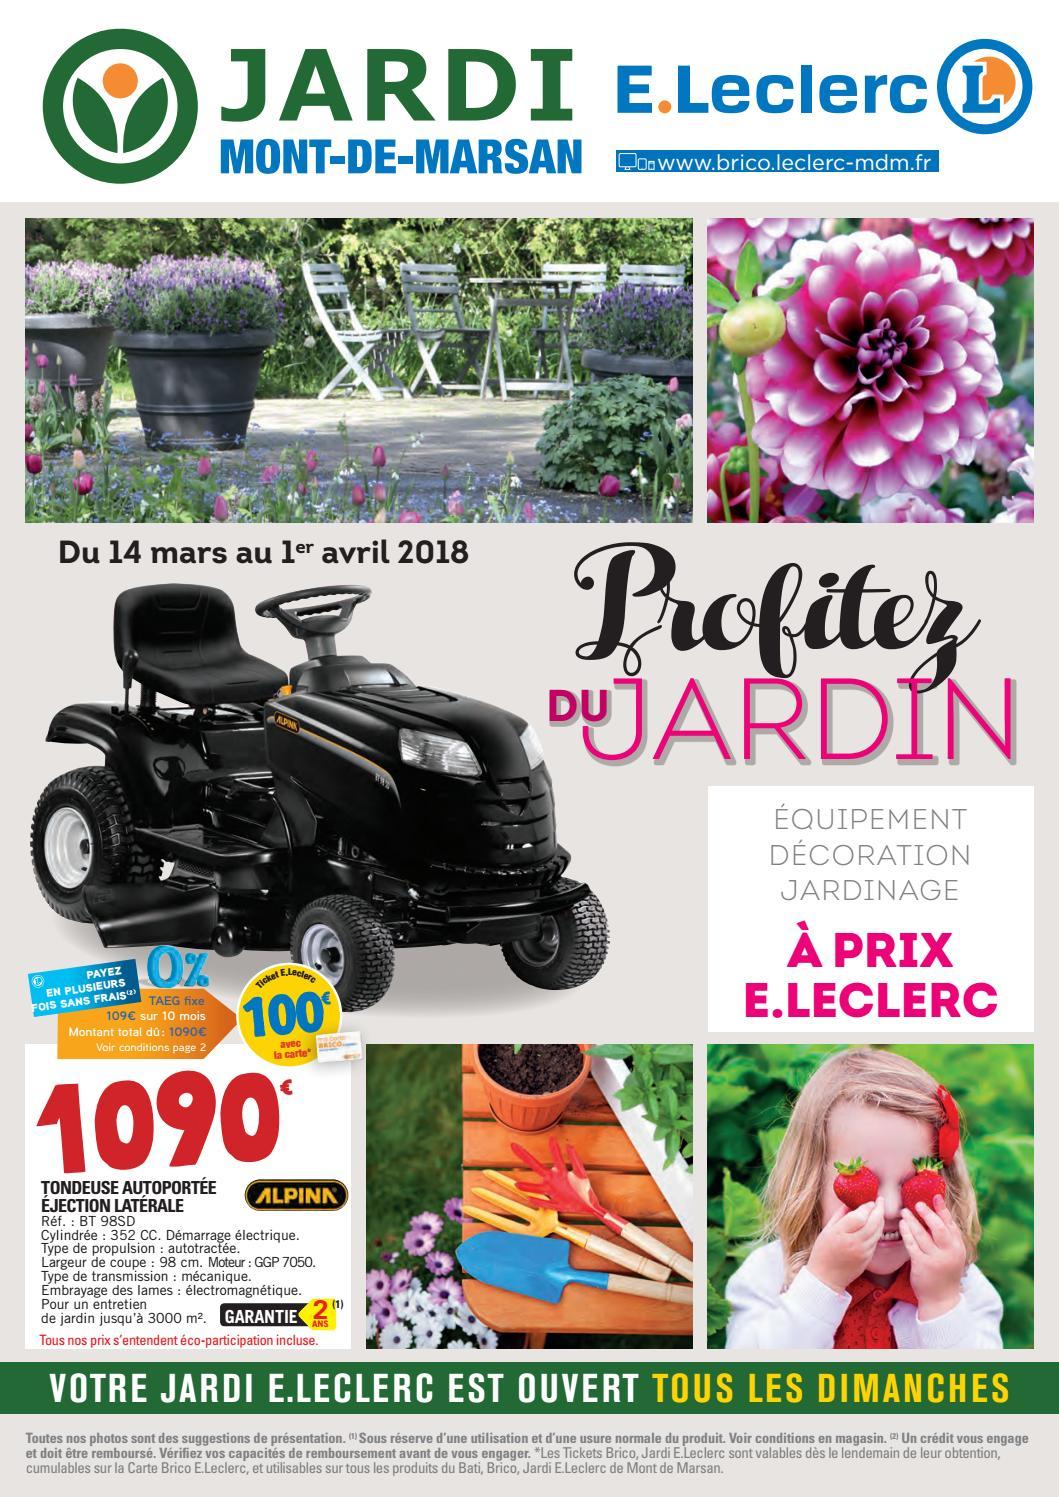 Catalogue Jardin - Jardi E.leclerc By Chou Magazine - Issuu pour Table De Jardin Magasin Leclerc